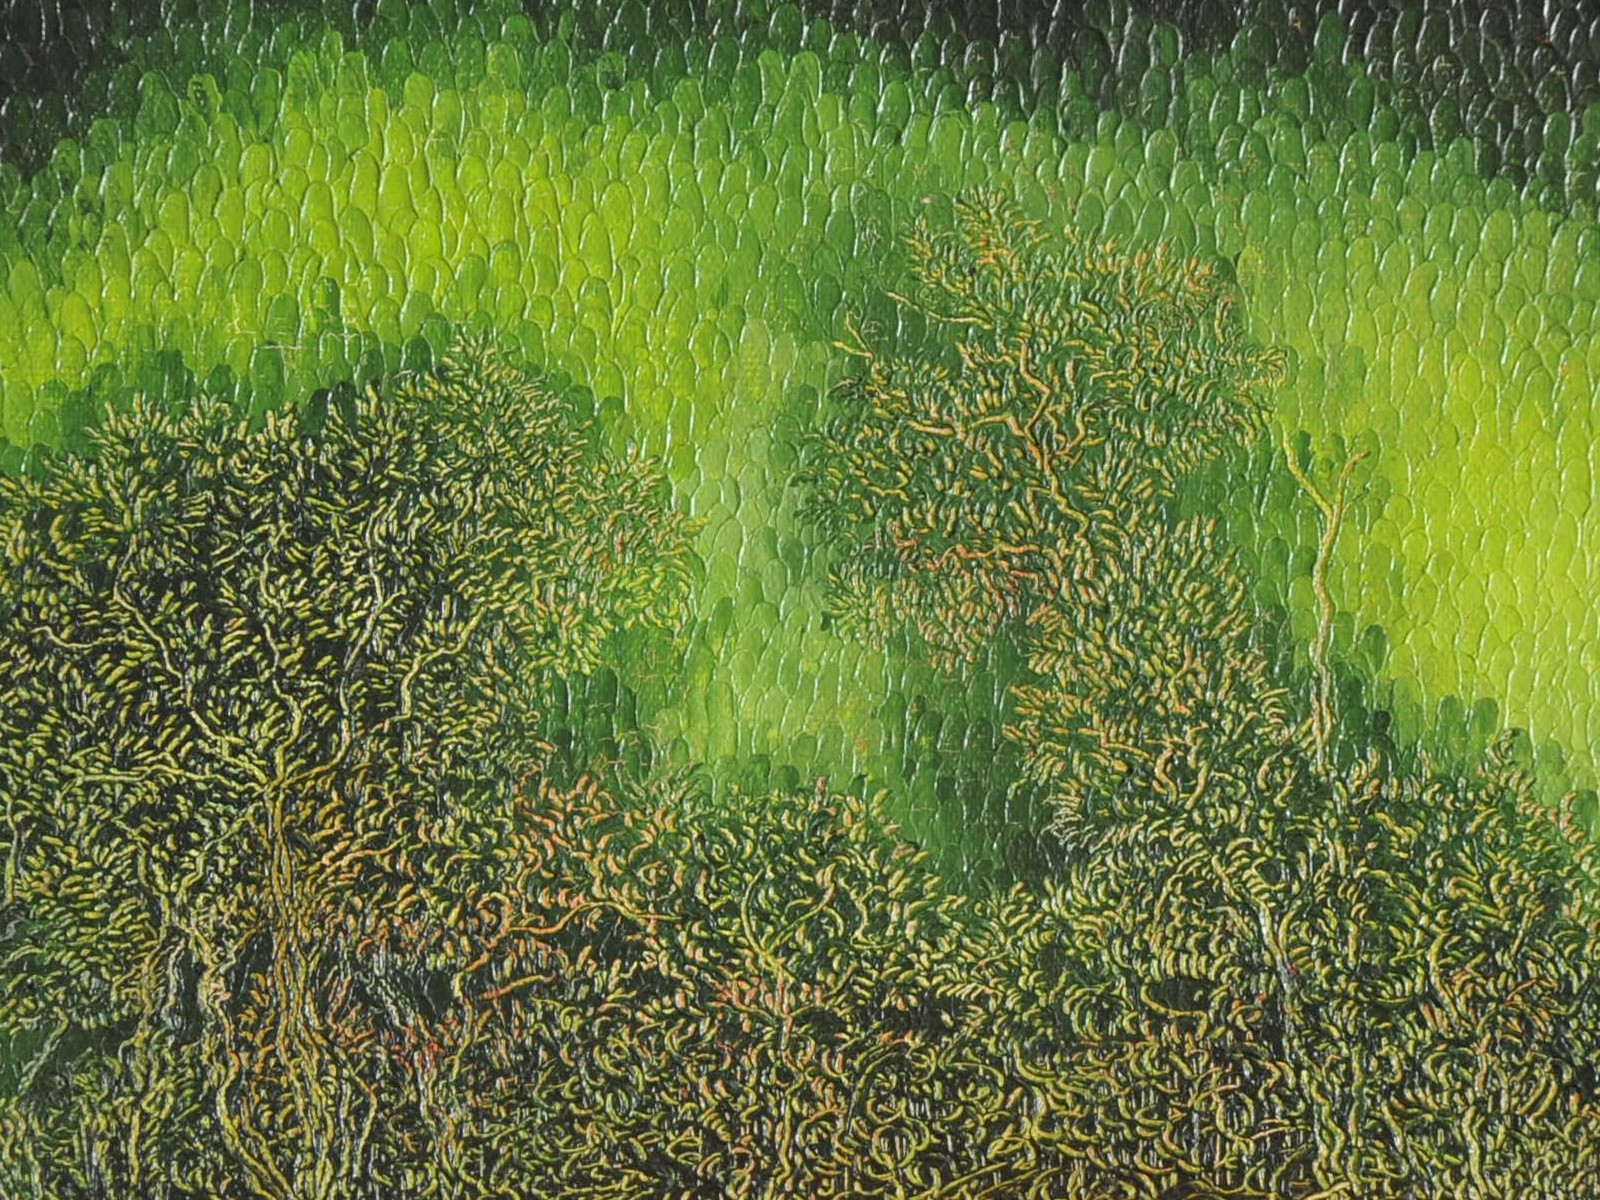 Aube verte: Huile sur toile